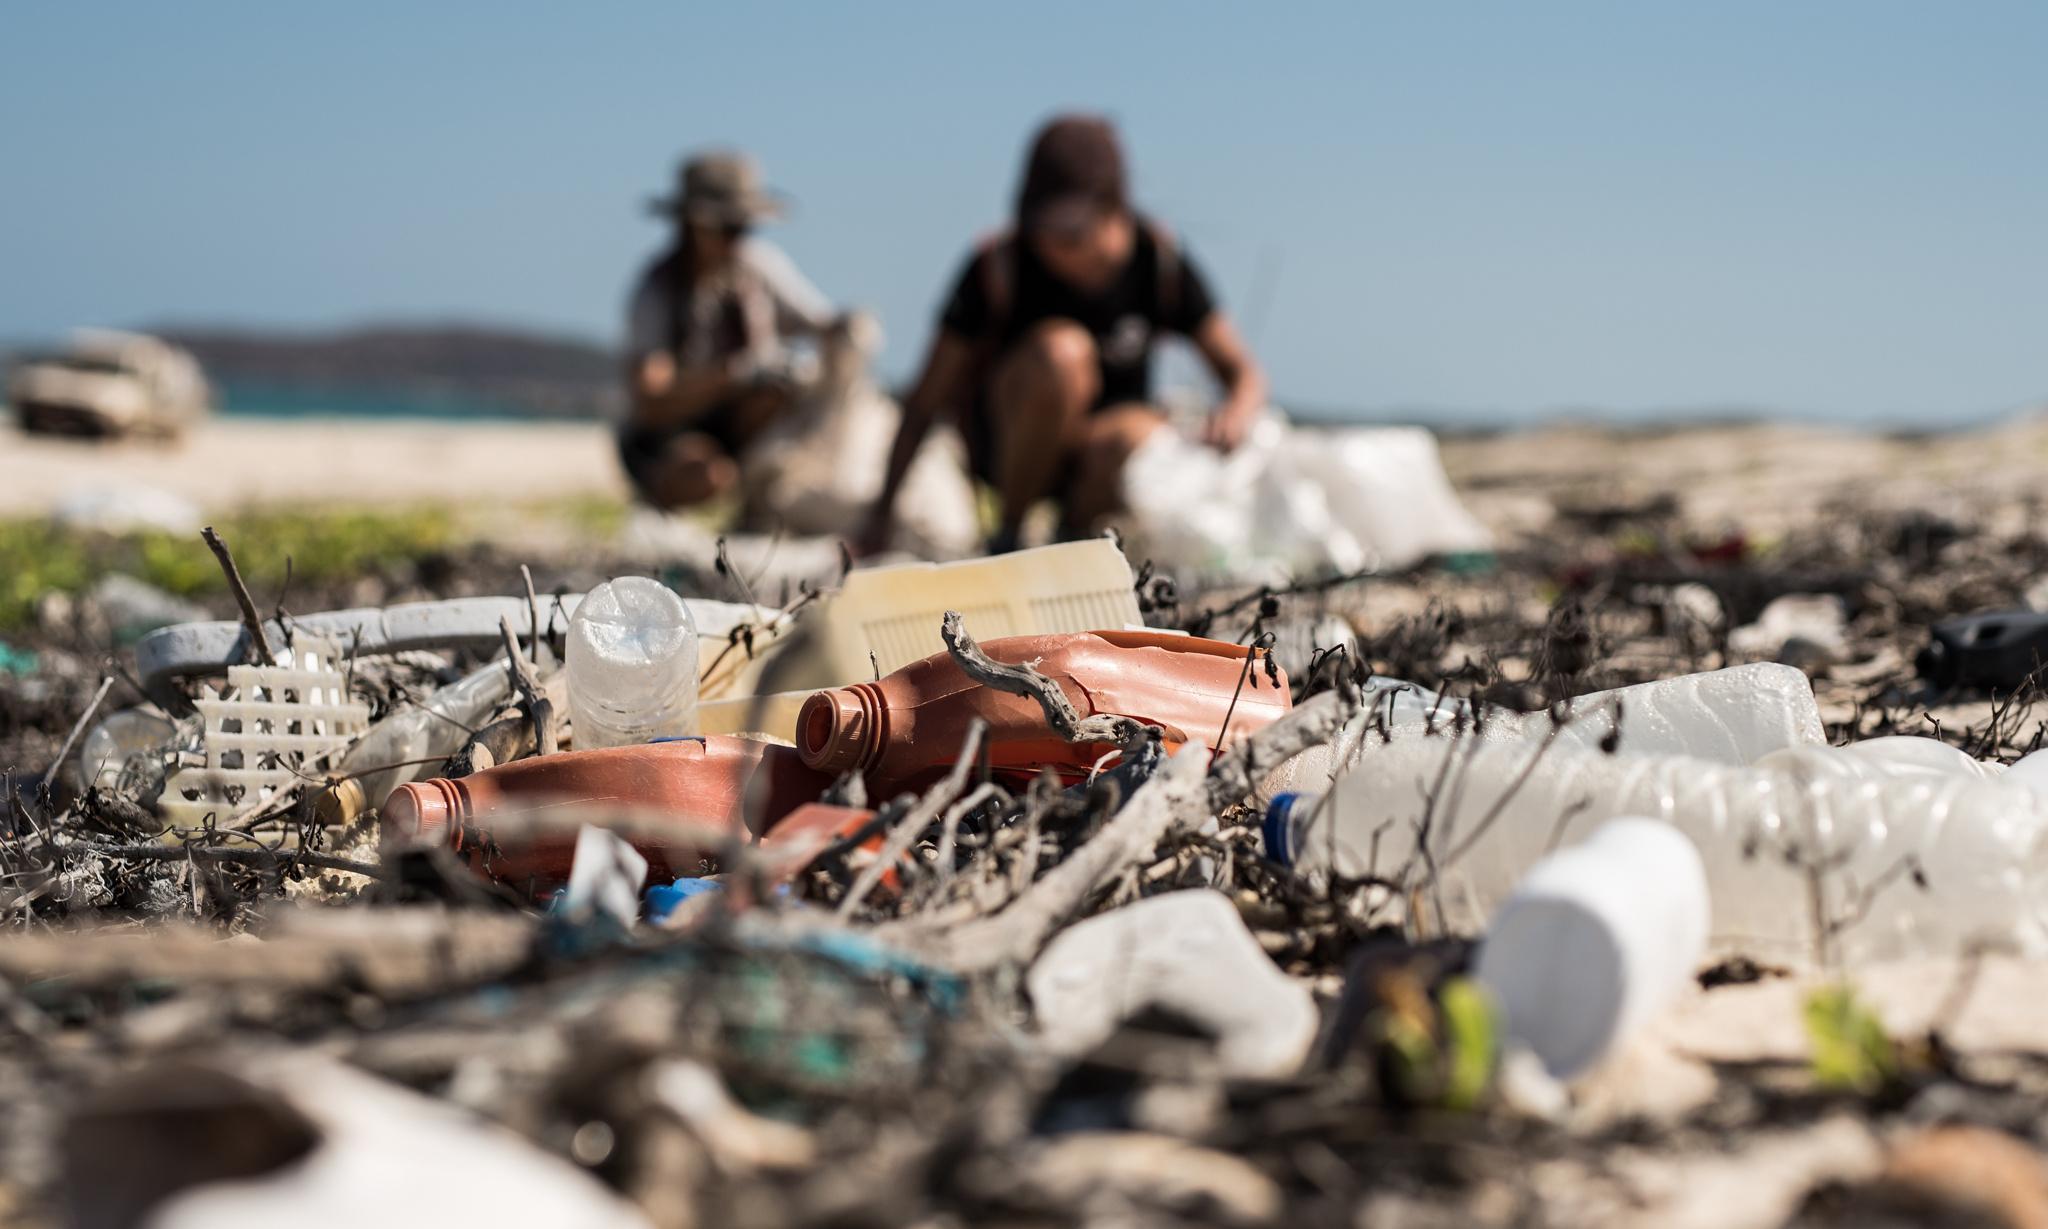 Seven tonnes of marine plastic pollution collected on remote Arnhem Land beach